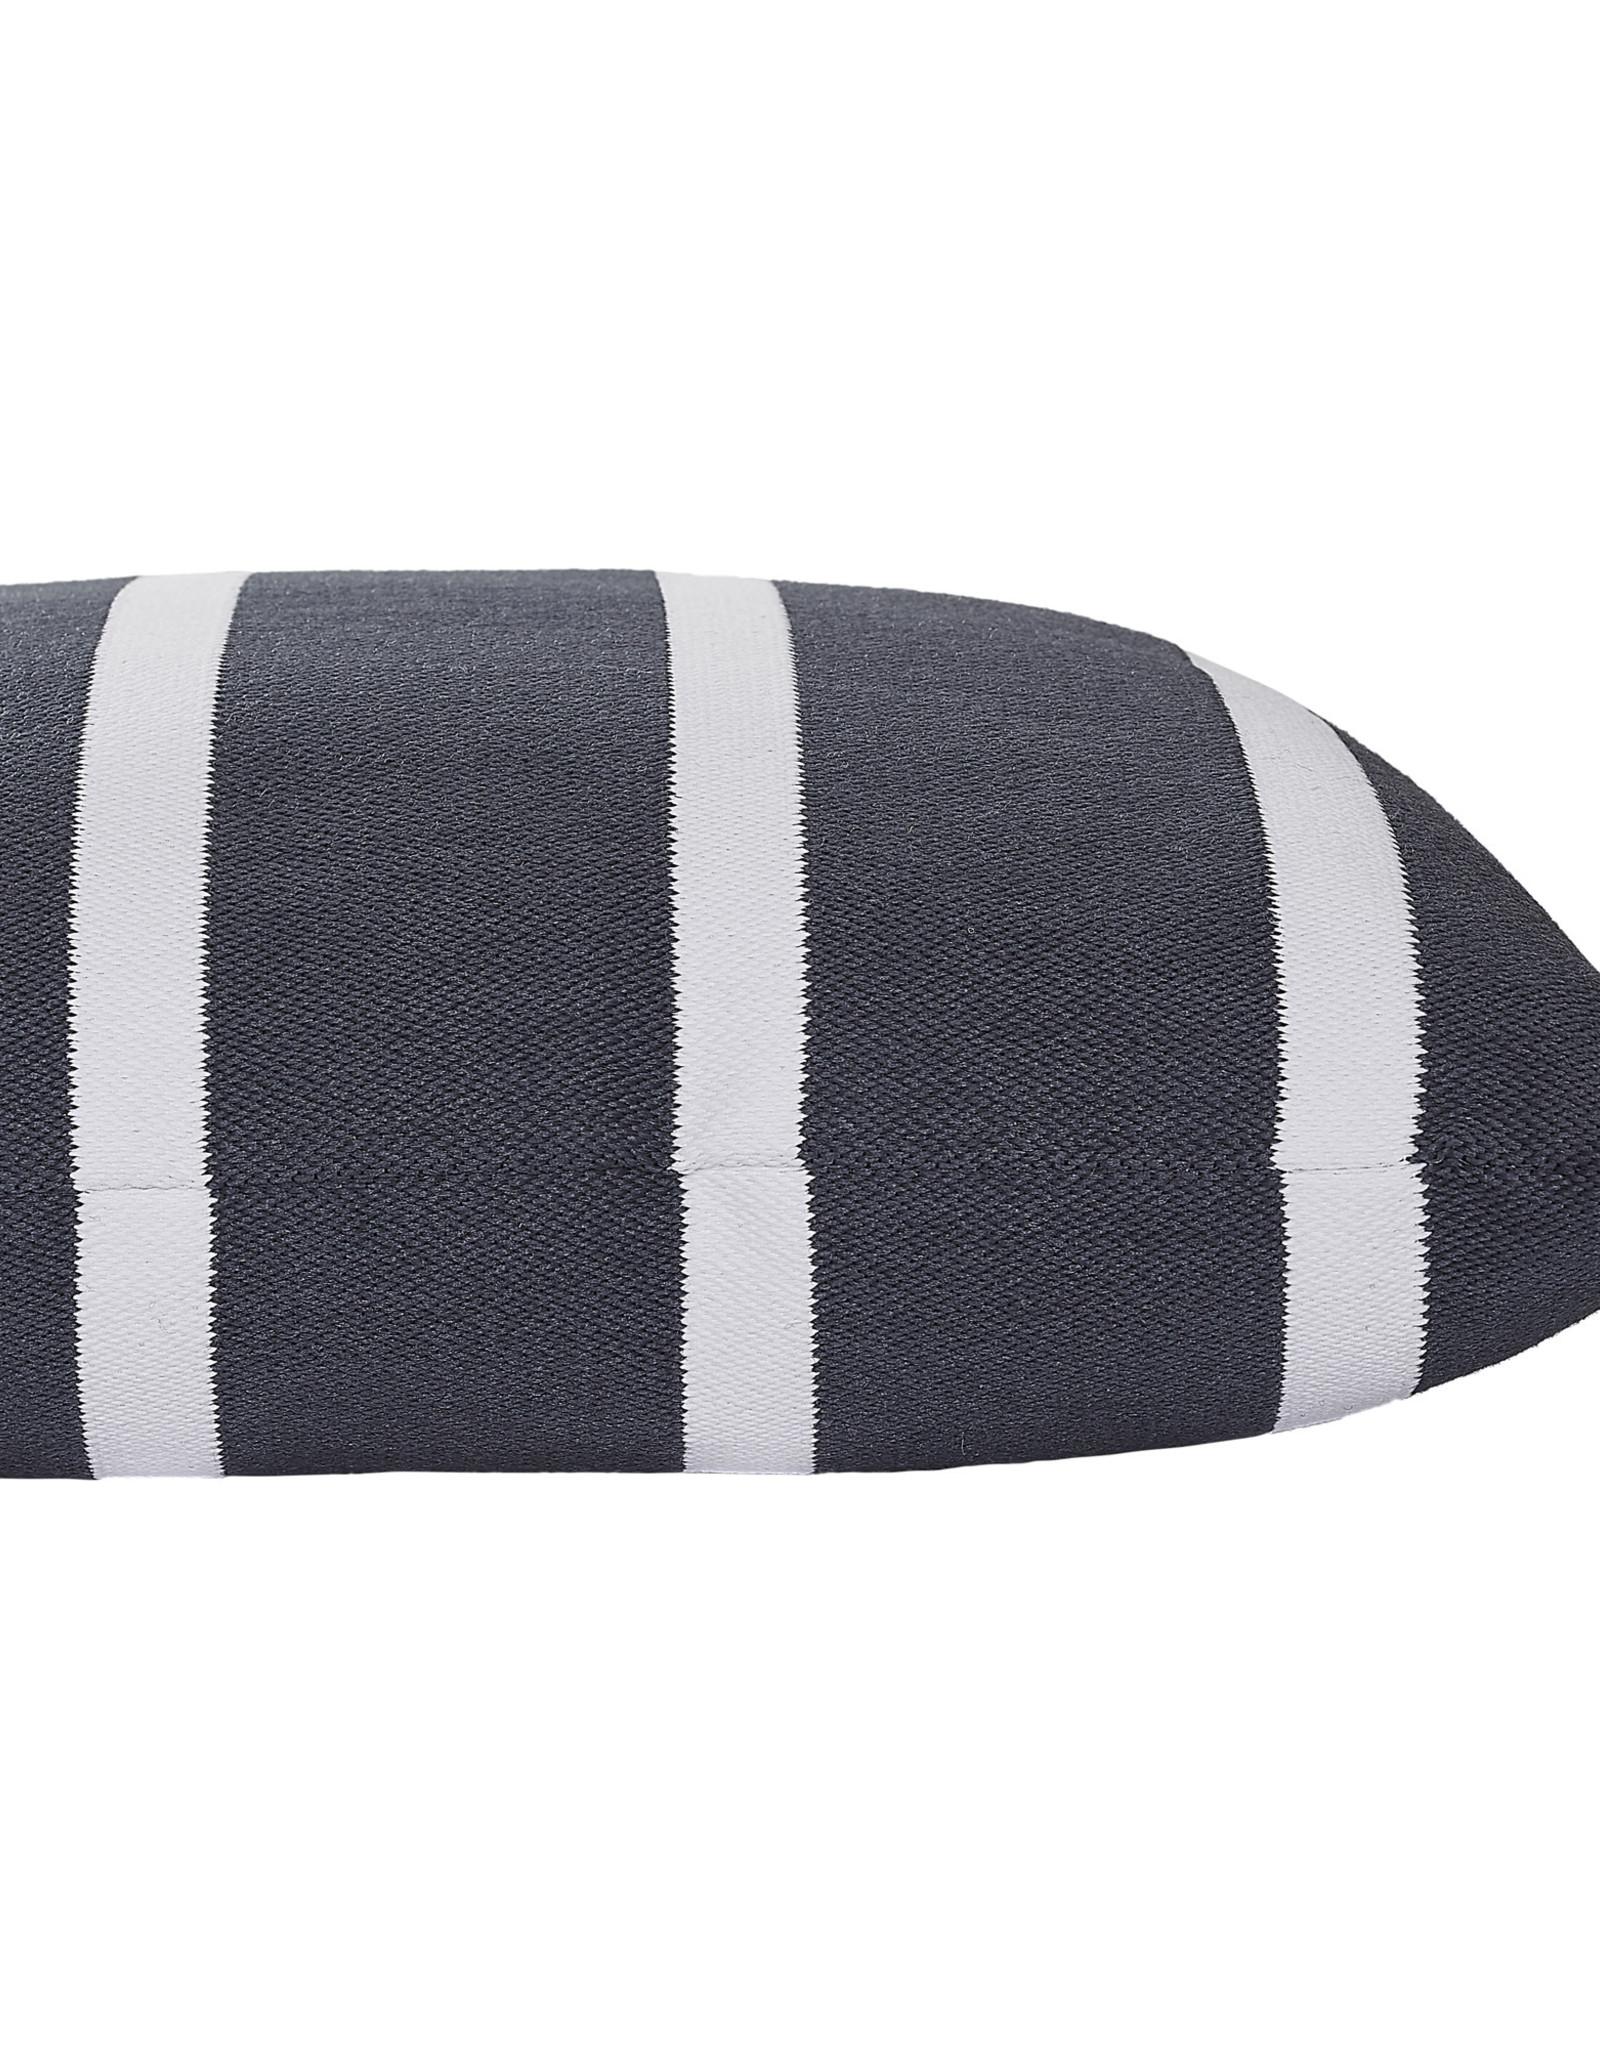 Commack - Outdoor Pillow